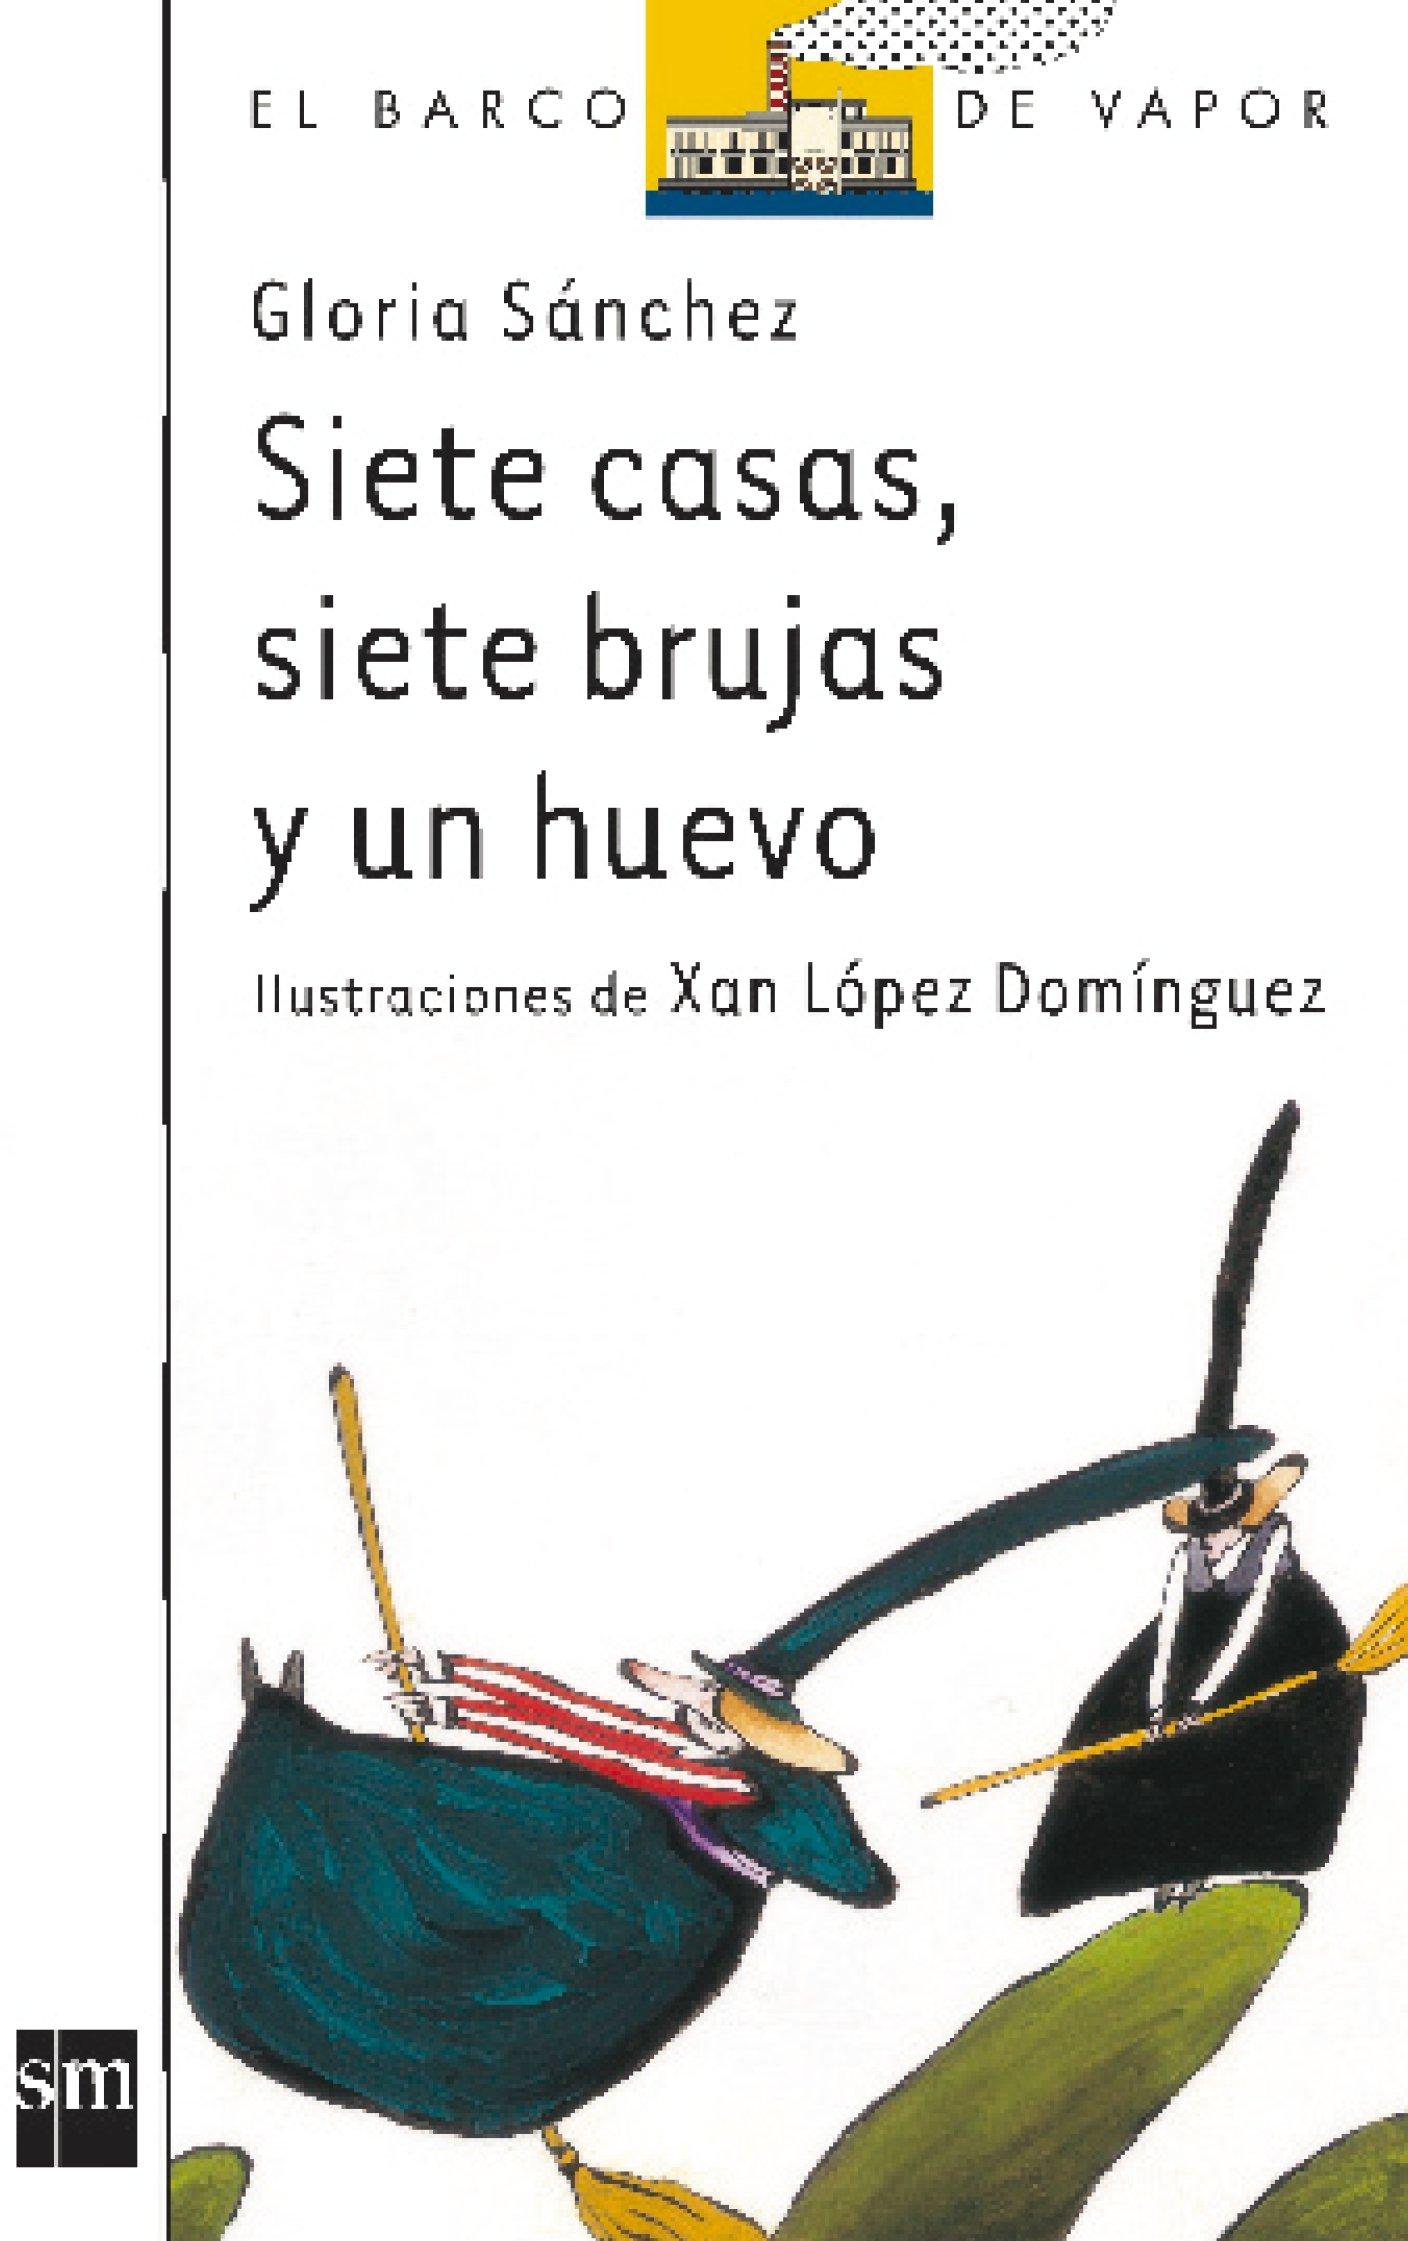 Siete Casas, Siete Brujas Y Un Huevo/ Seven House, Seven Witches and One Egg (El Barco De Vapor) (Spanish Edition) pdf epub